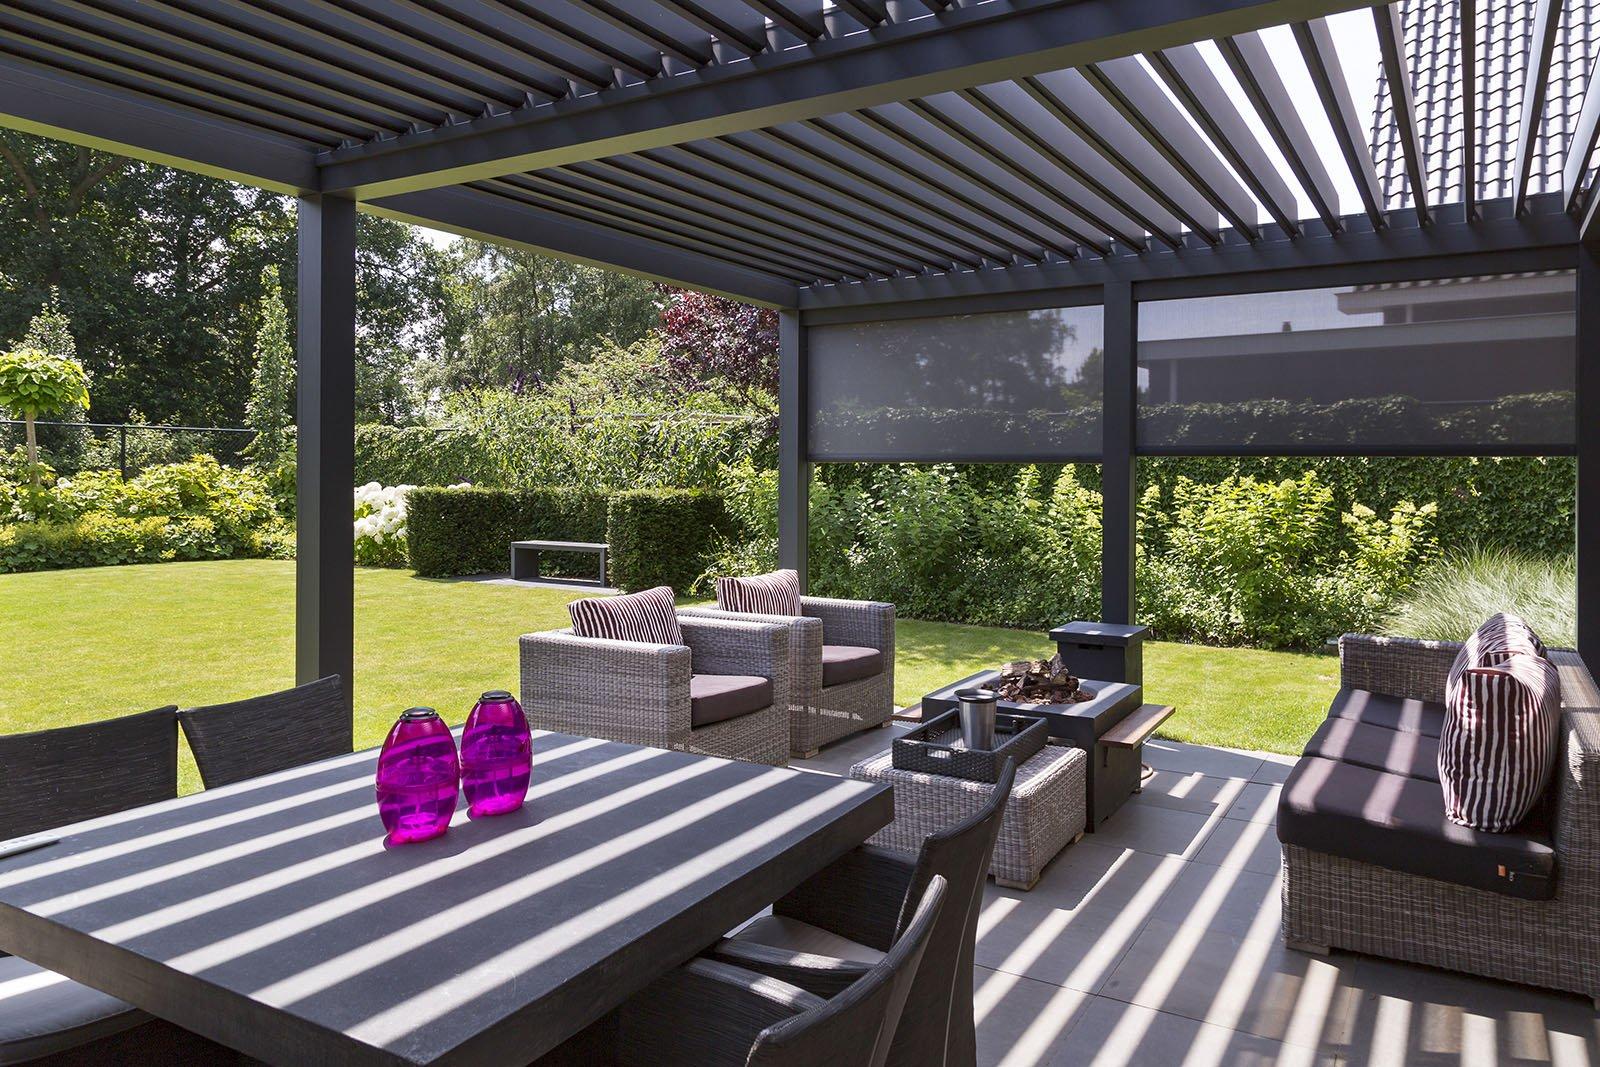 Overdekt terras met lamellendak en zonneschermen - ritzscreens - via Verano